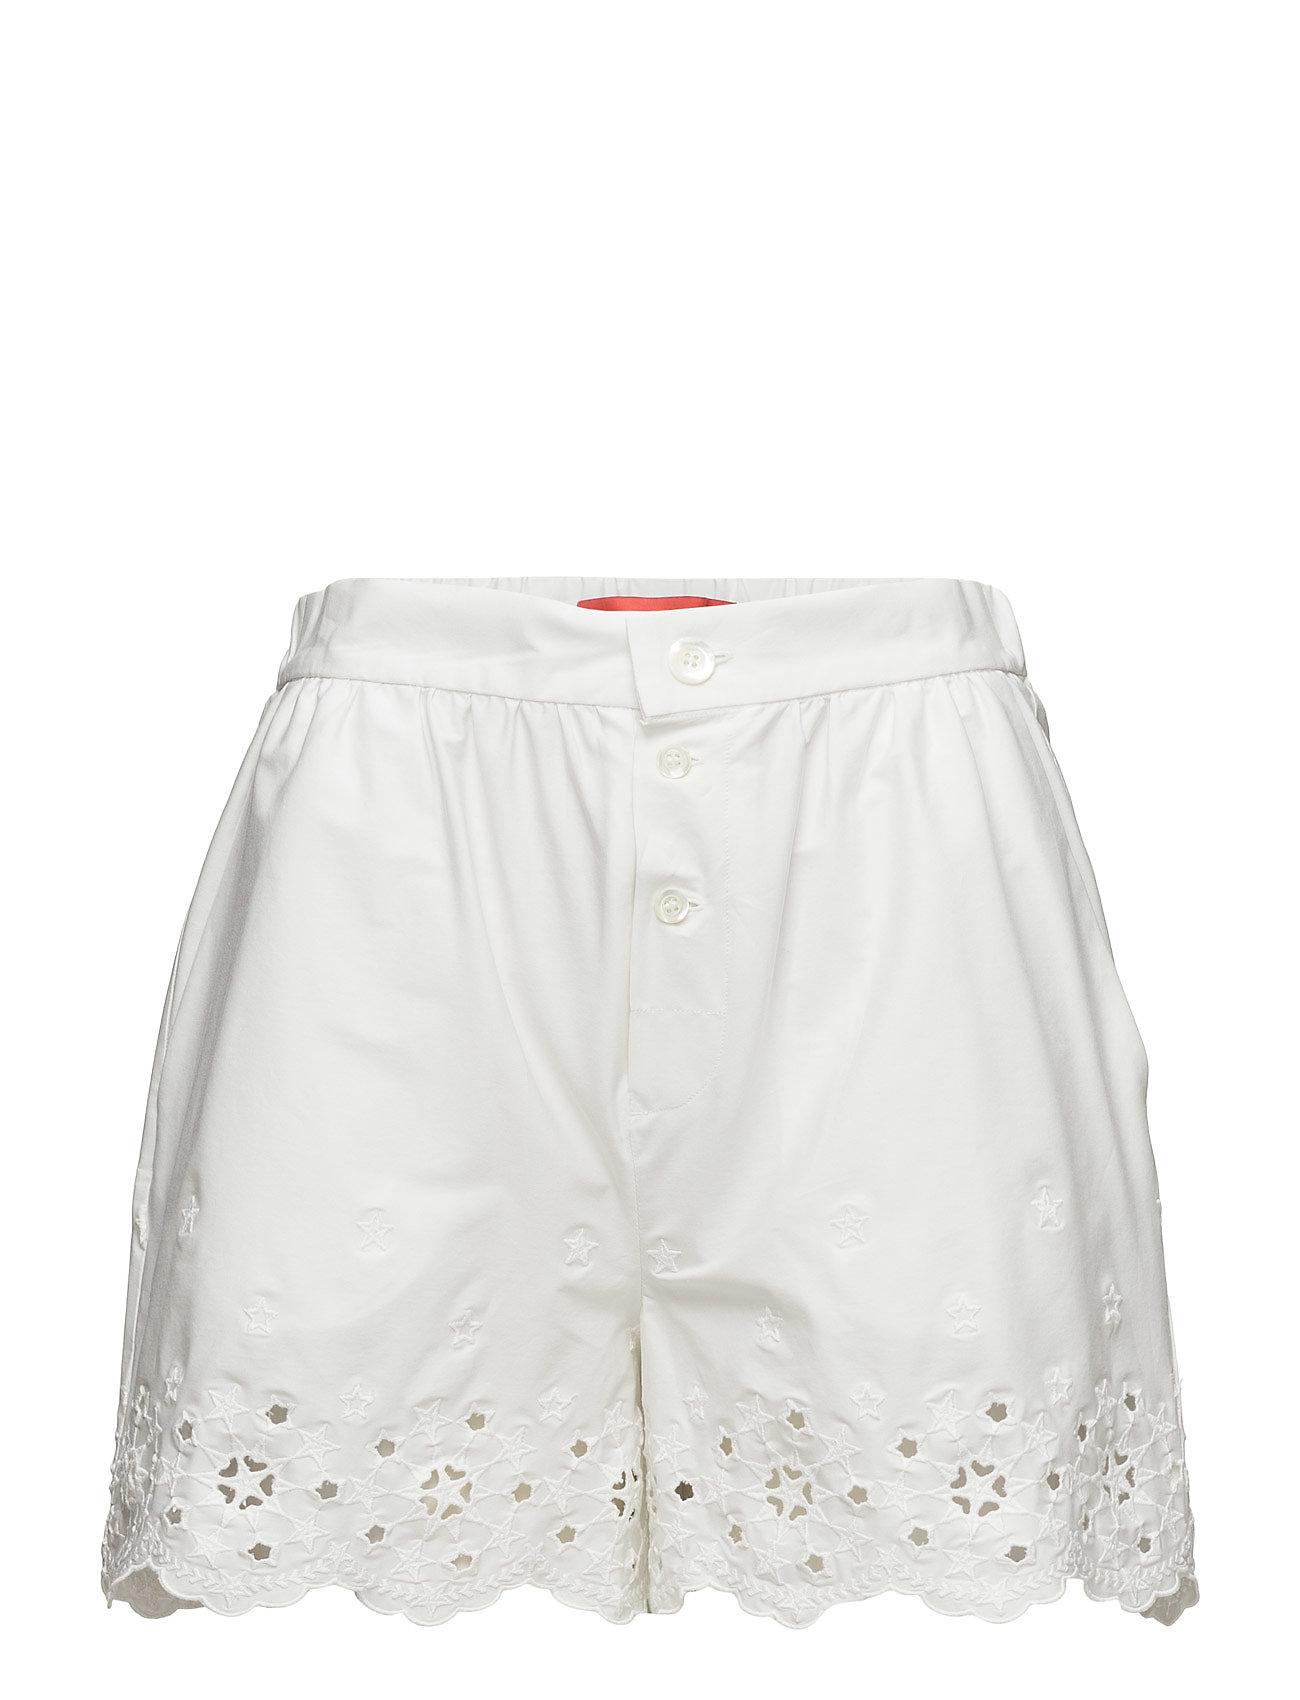 Hilfiger Collection EYELETTING SHORTS Shorts